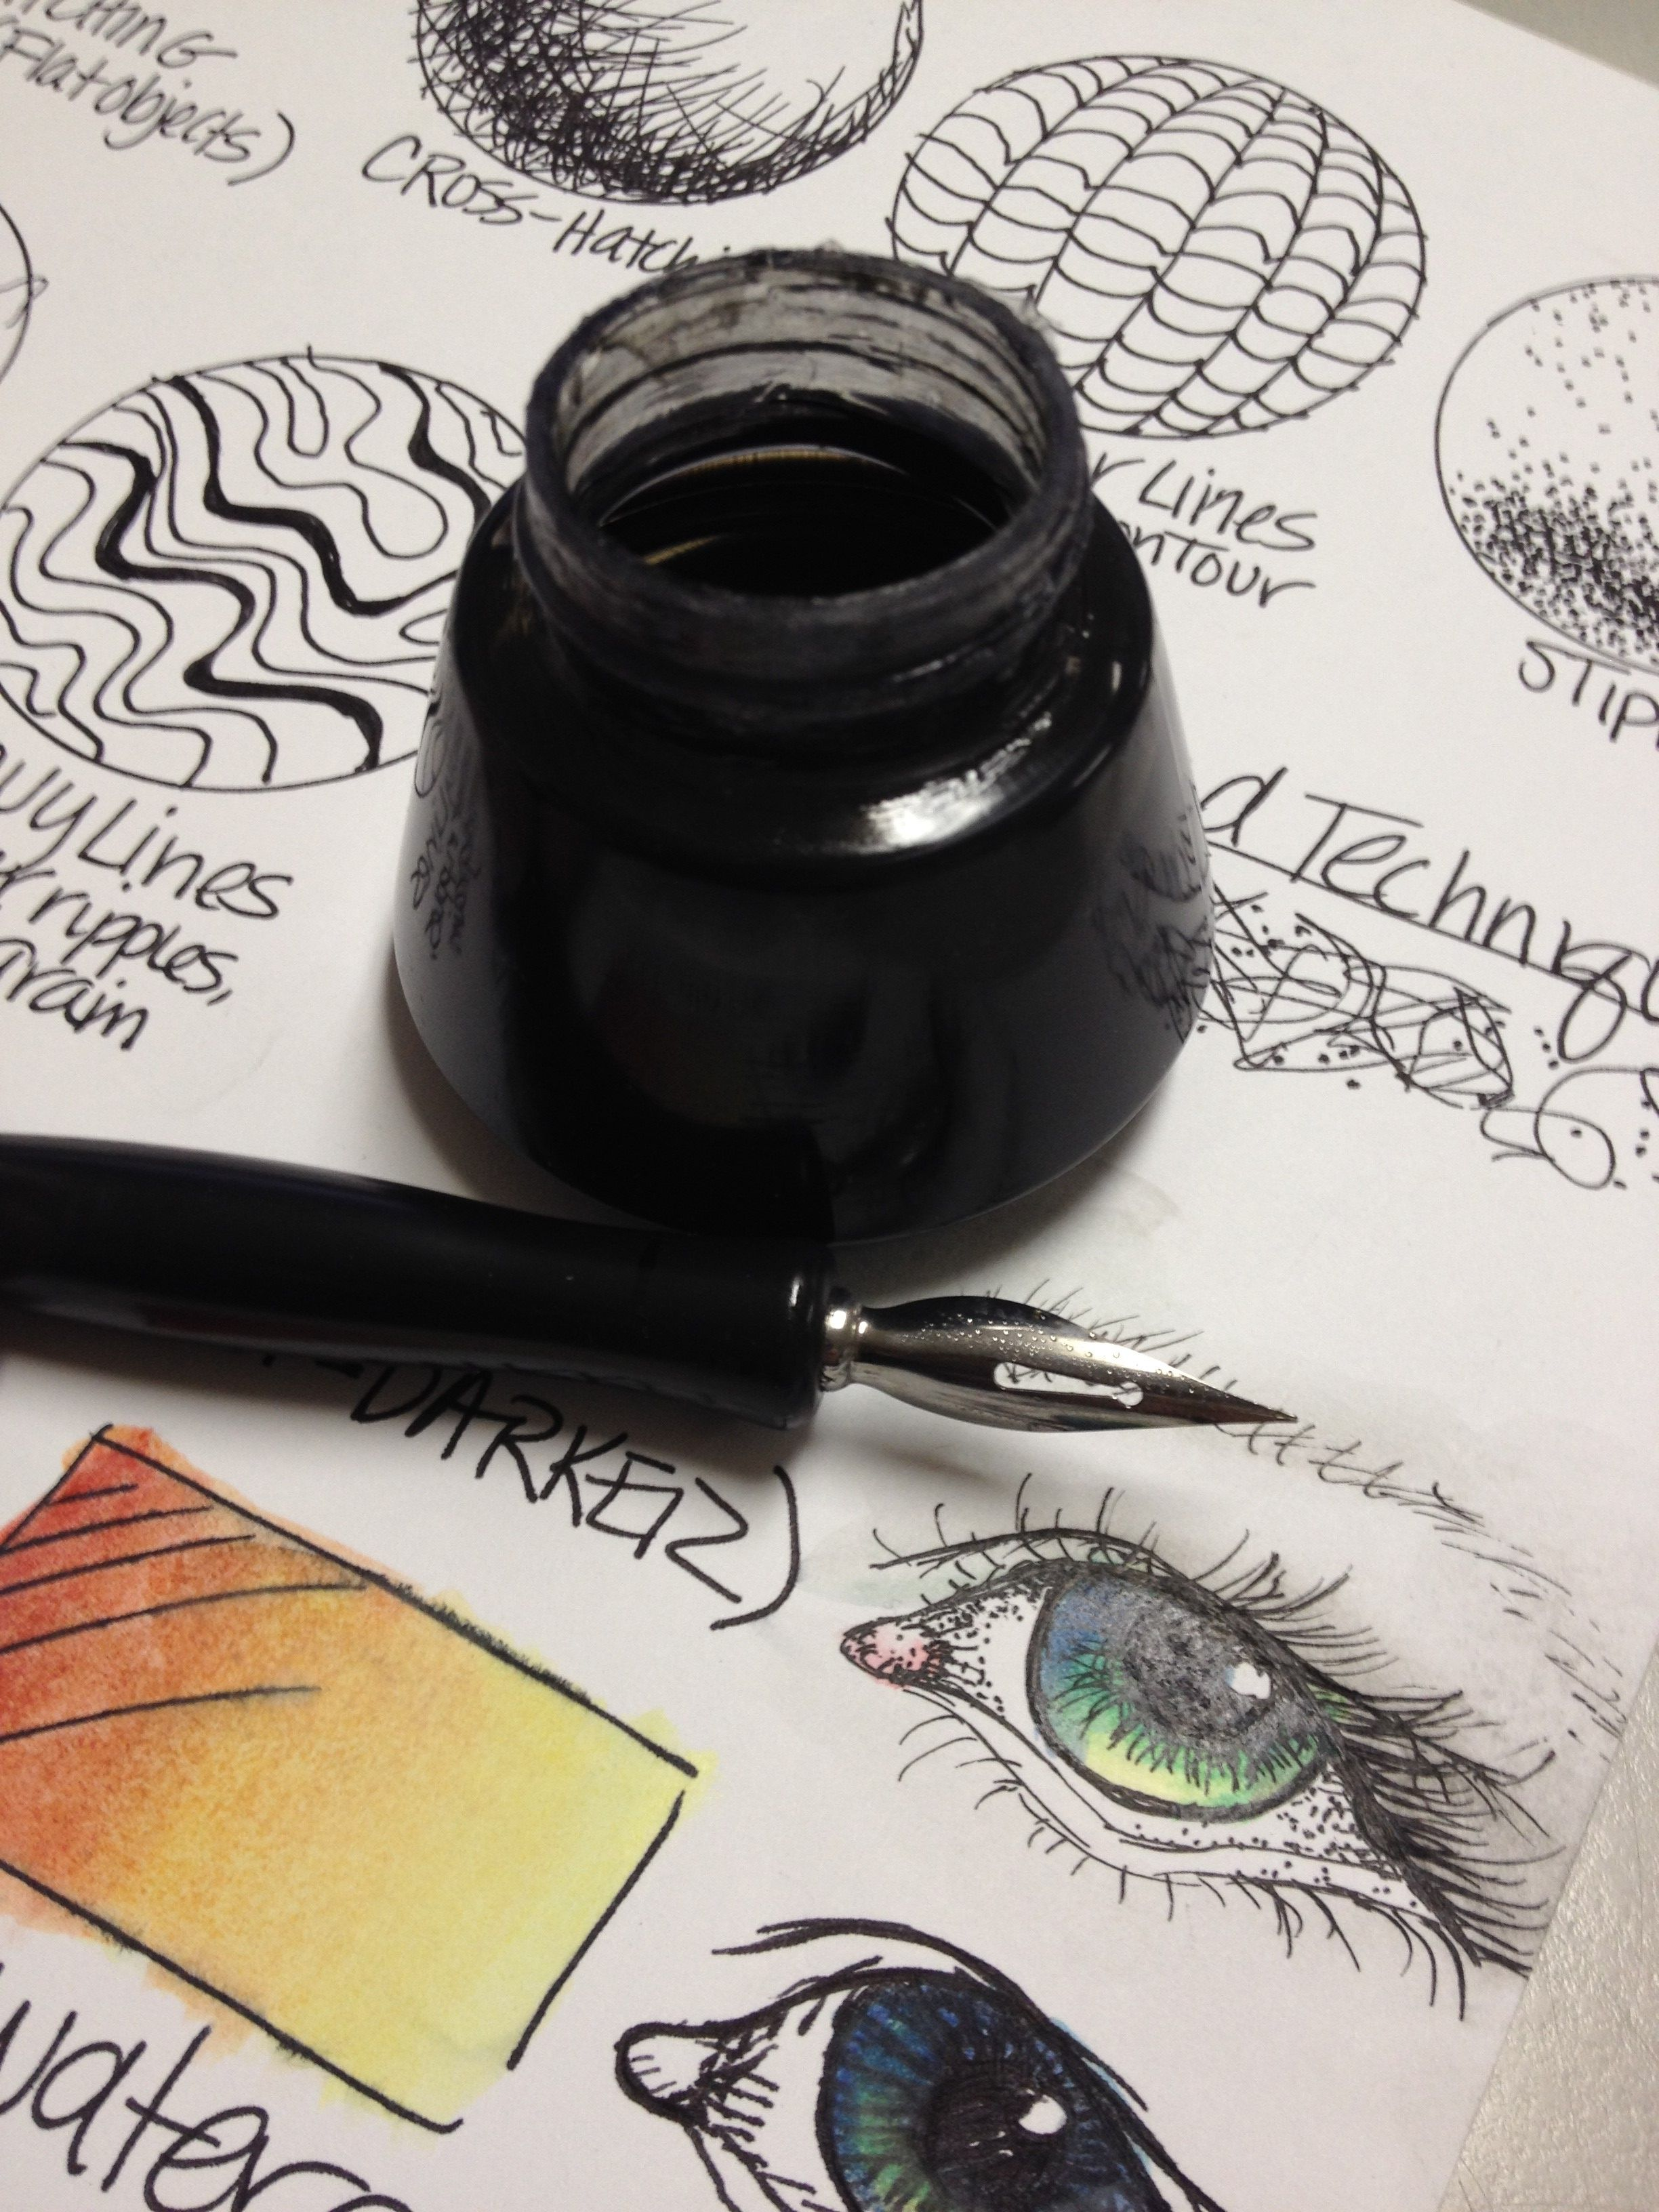 Pen Amp Ink Techniques Lesson Plan Amp Worksheet